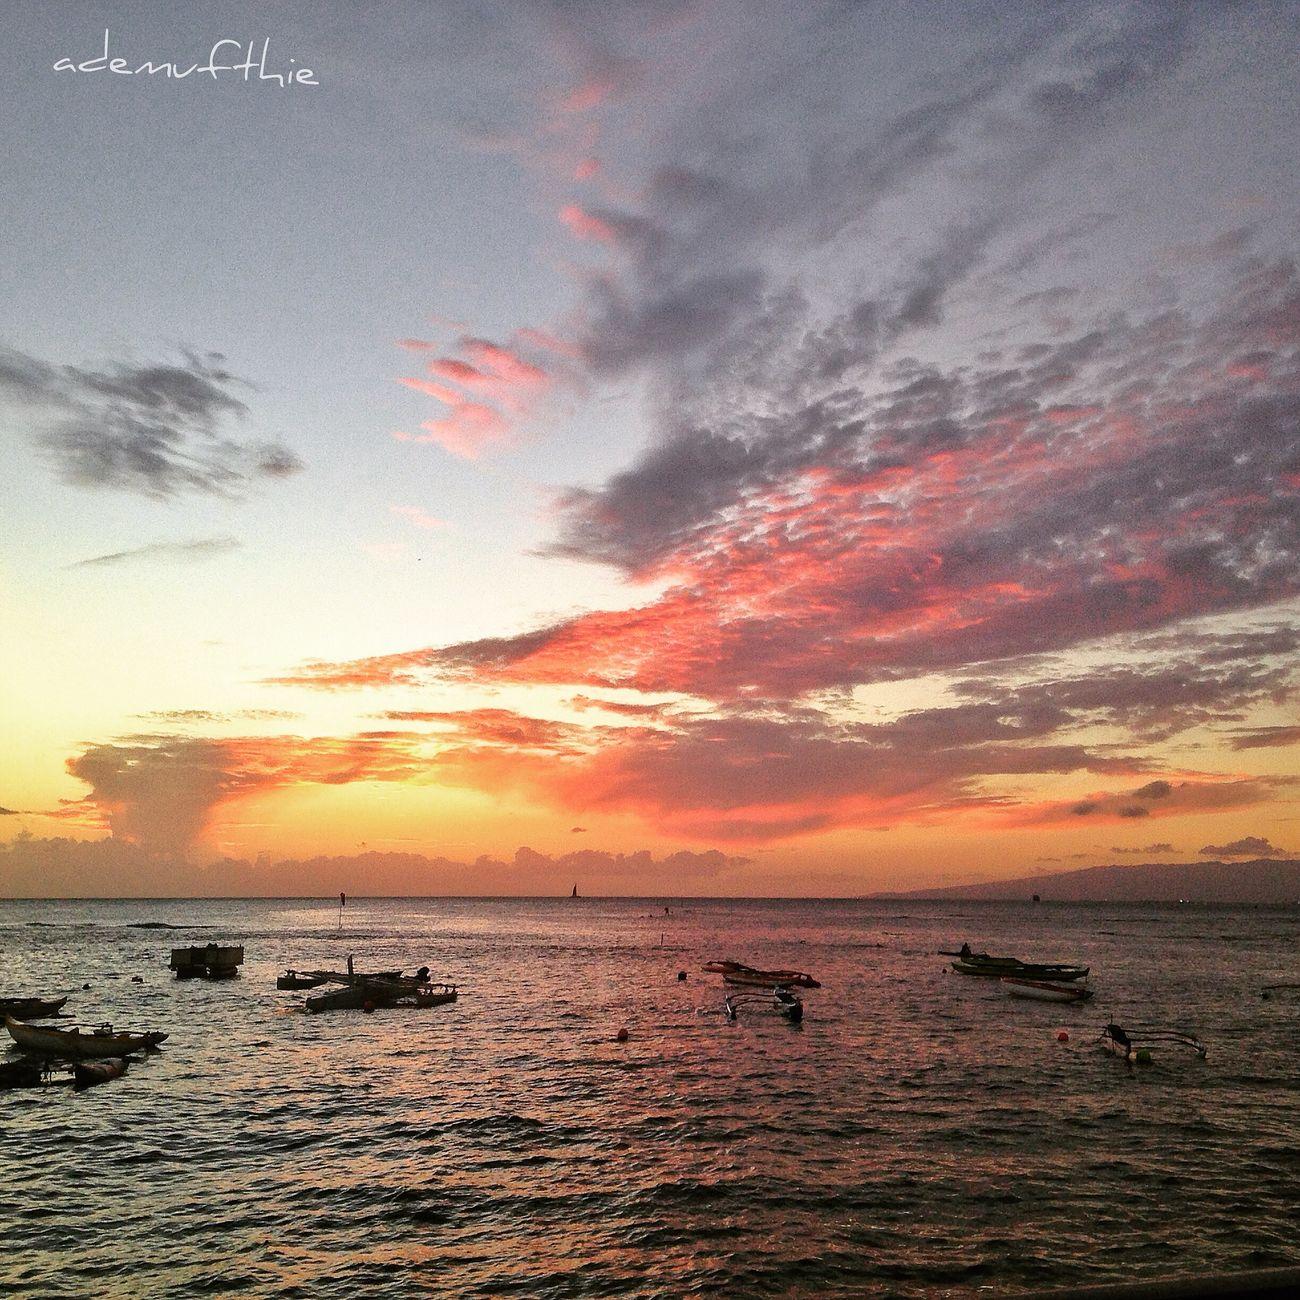 Burned Cloudporn Sunset #sun #clouds #skylovers #sky #nature #beautifulinnature #naturalbeauty #photography #landscape Sunset HDR EyeEm Best Shots Beautiful Nature